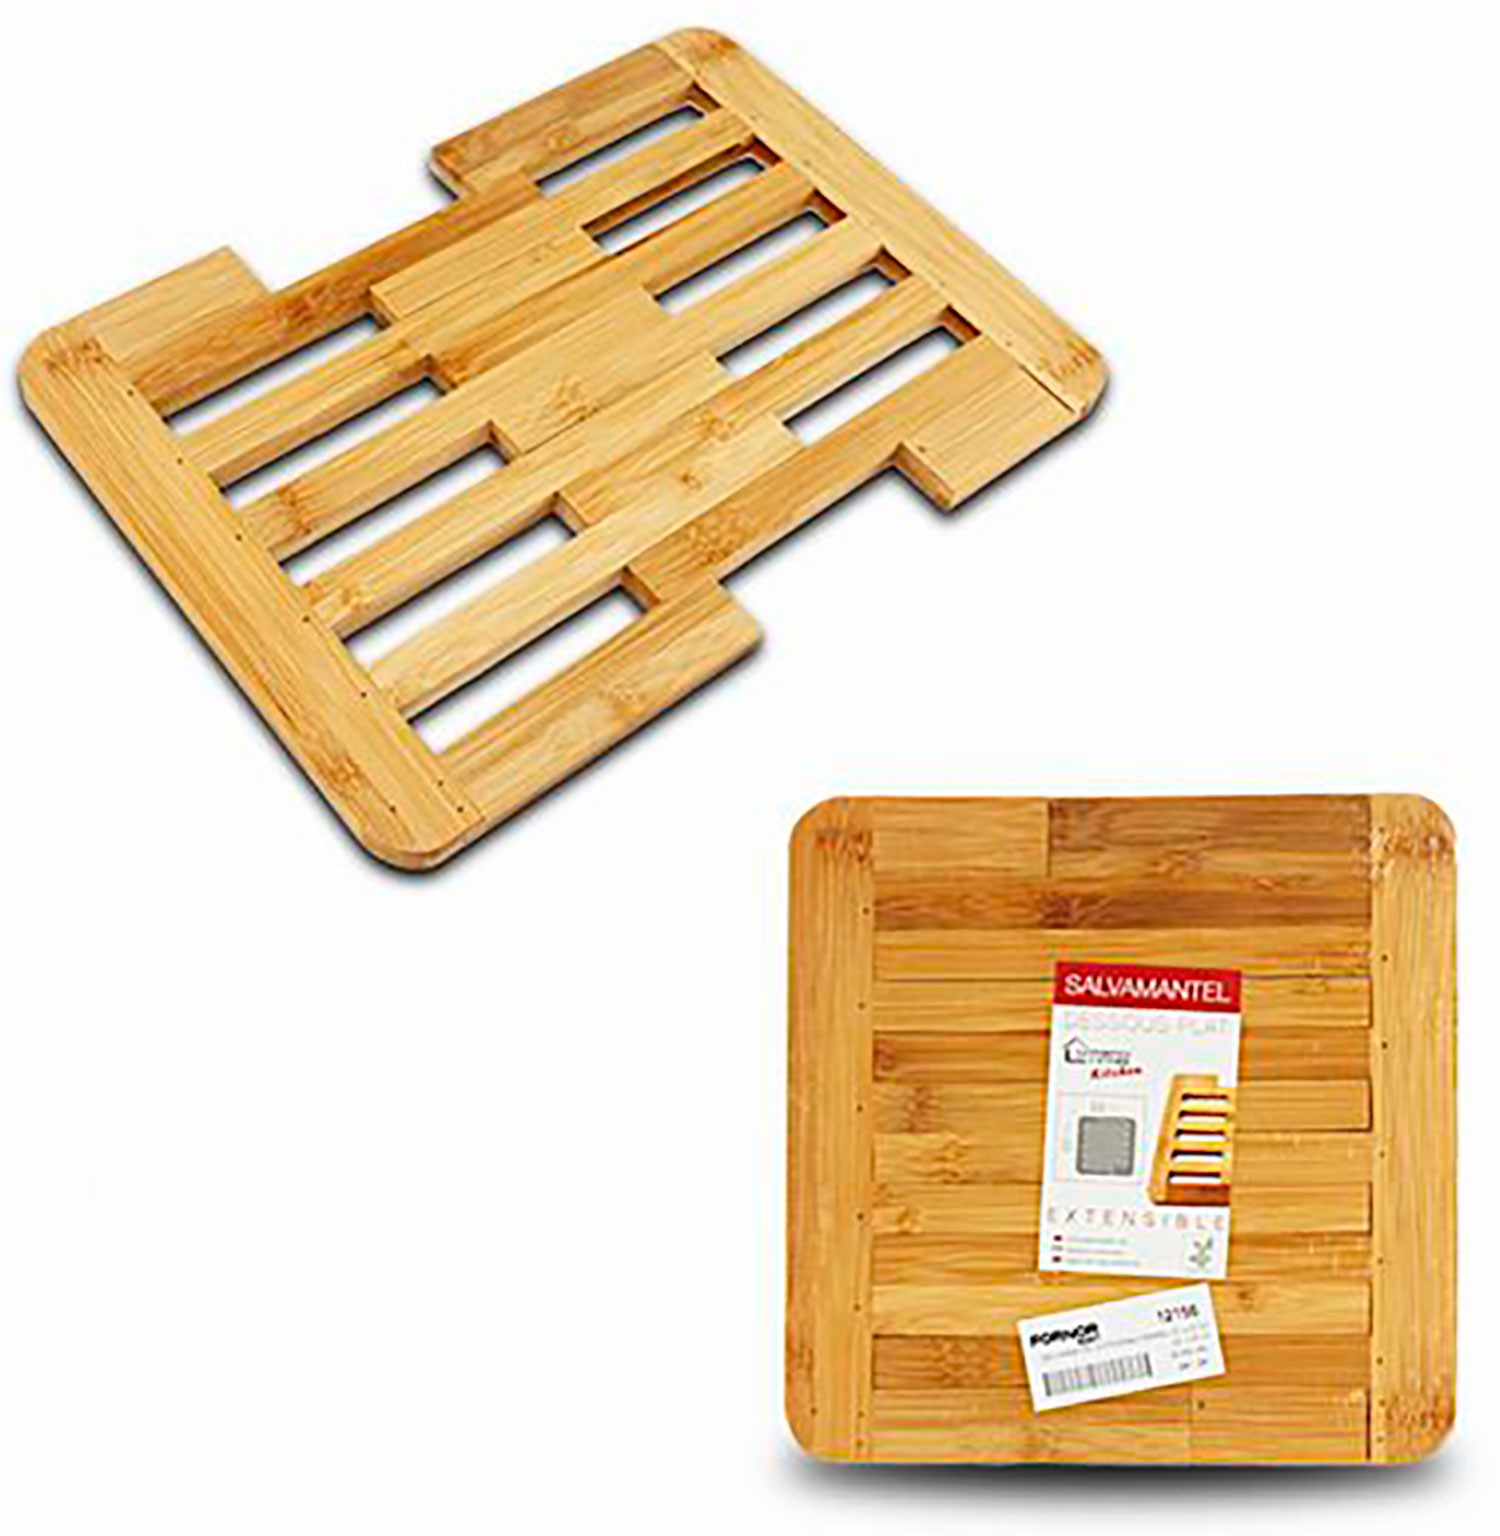 Salva mantel extensible de bambú Natural, Diseño original 22X22cm